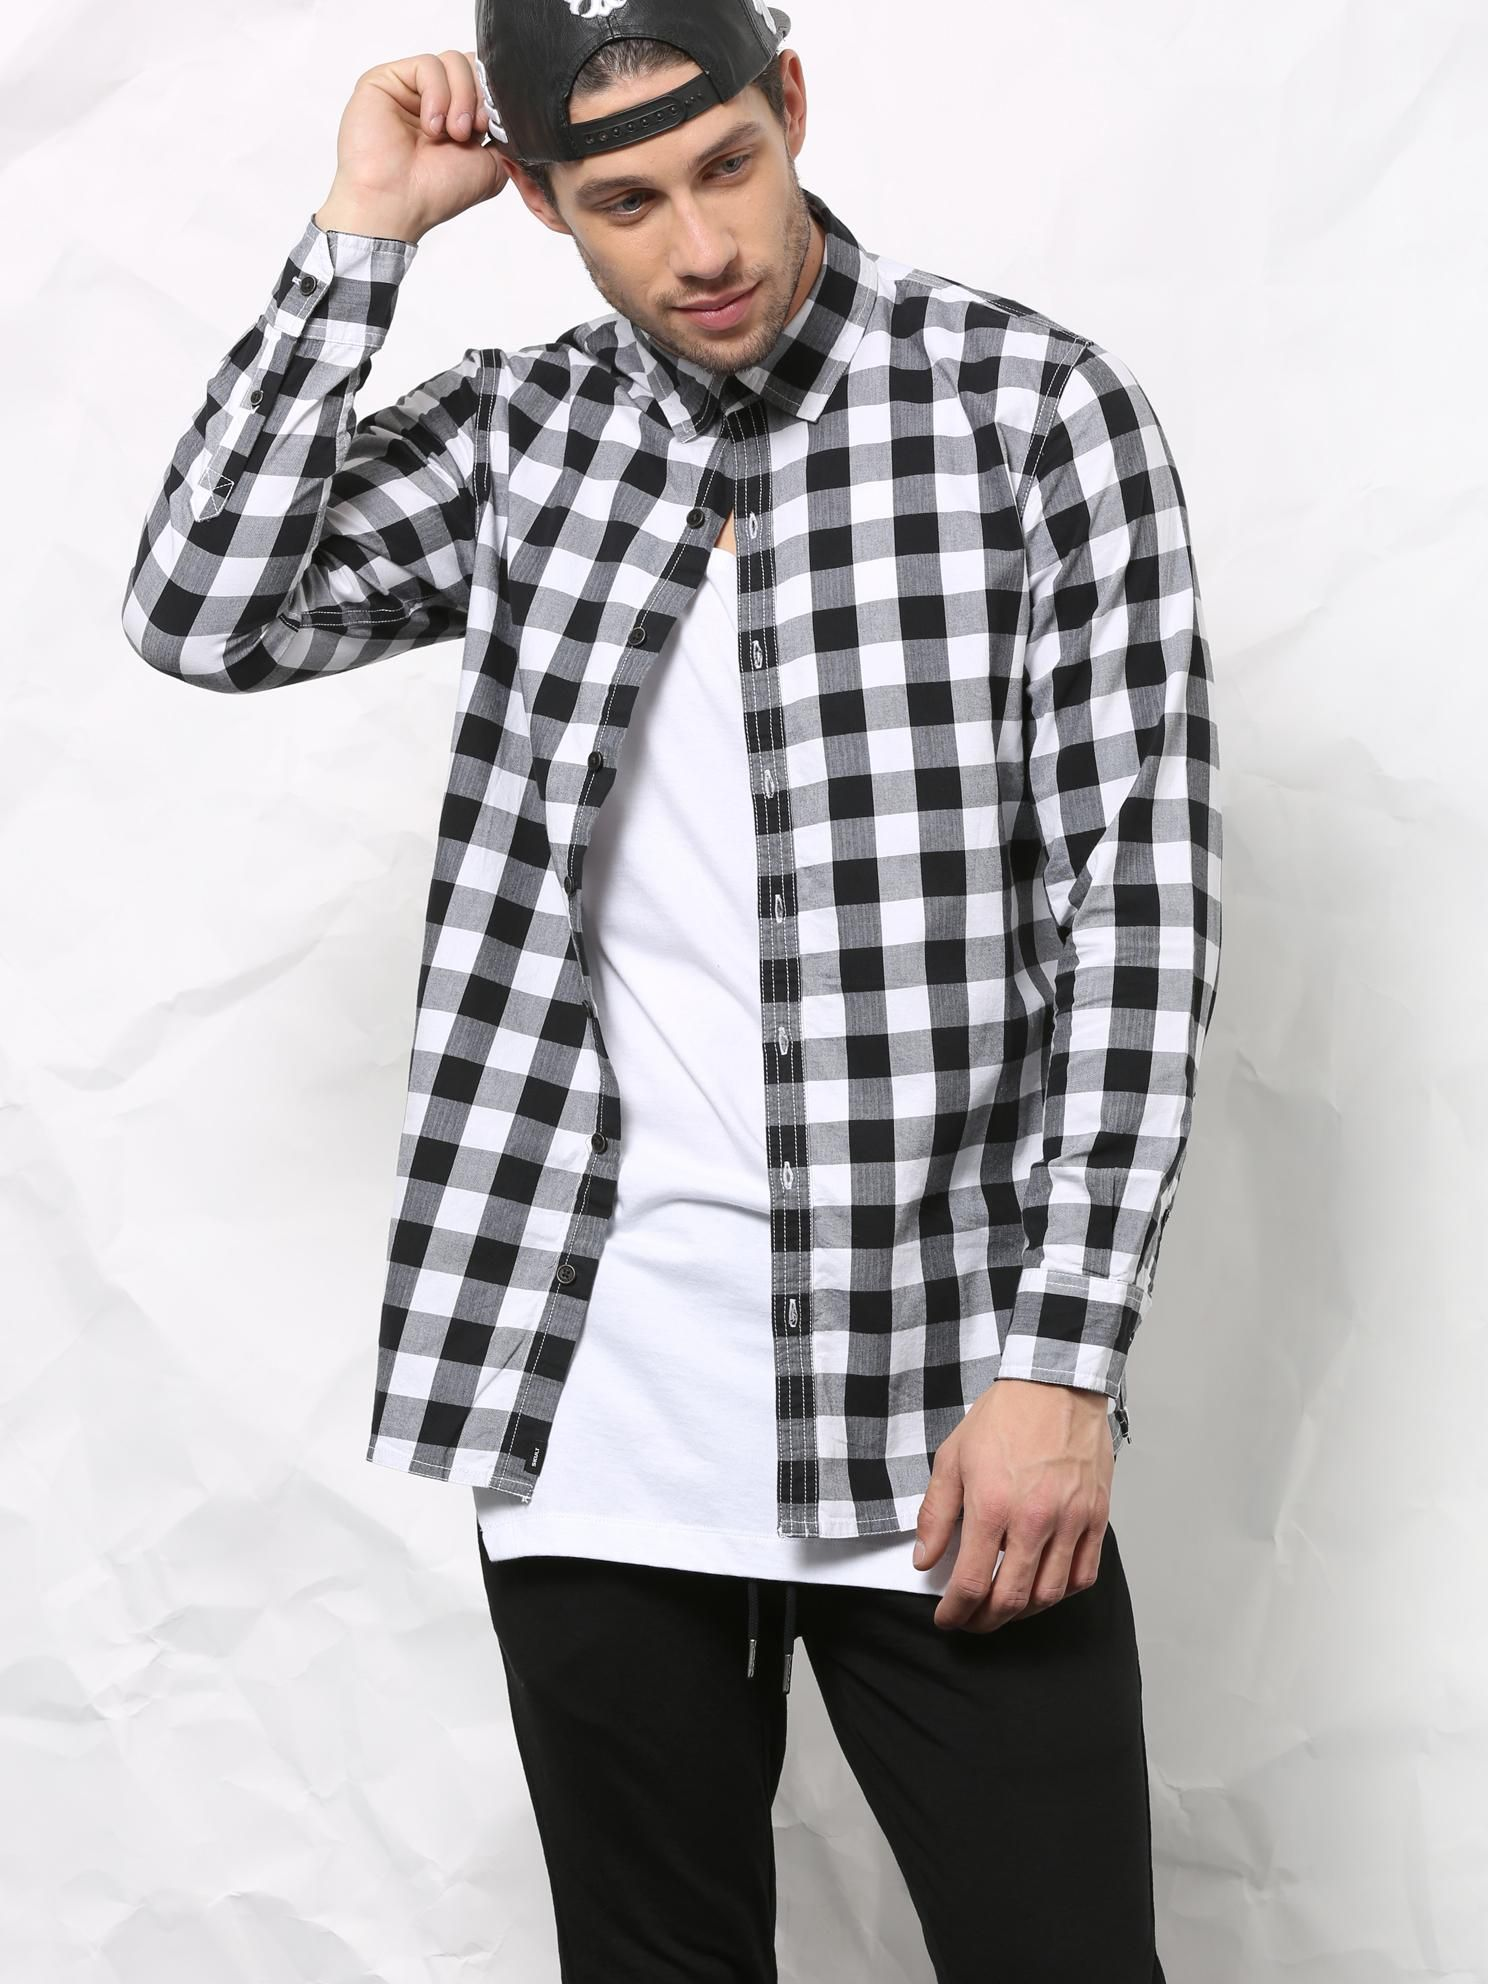 Buy SKULT Black & White Longline Side Zipper Shirt online. Stylish ShirtsBuffalo  CheckMen ...